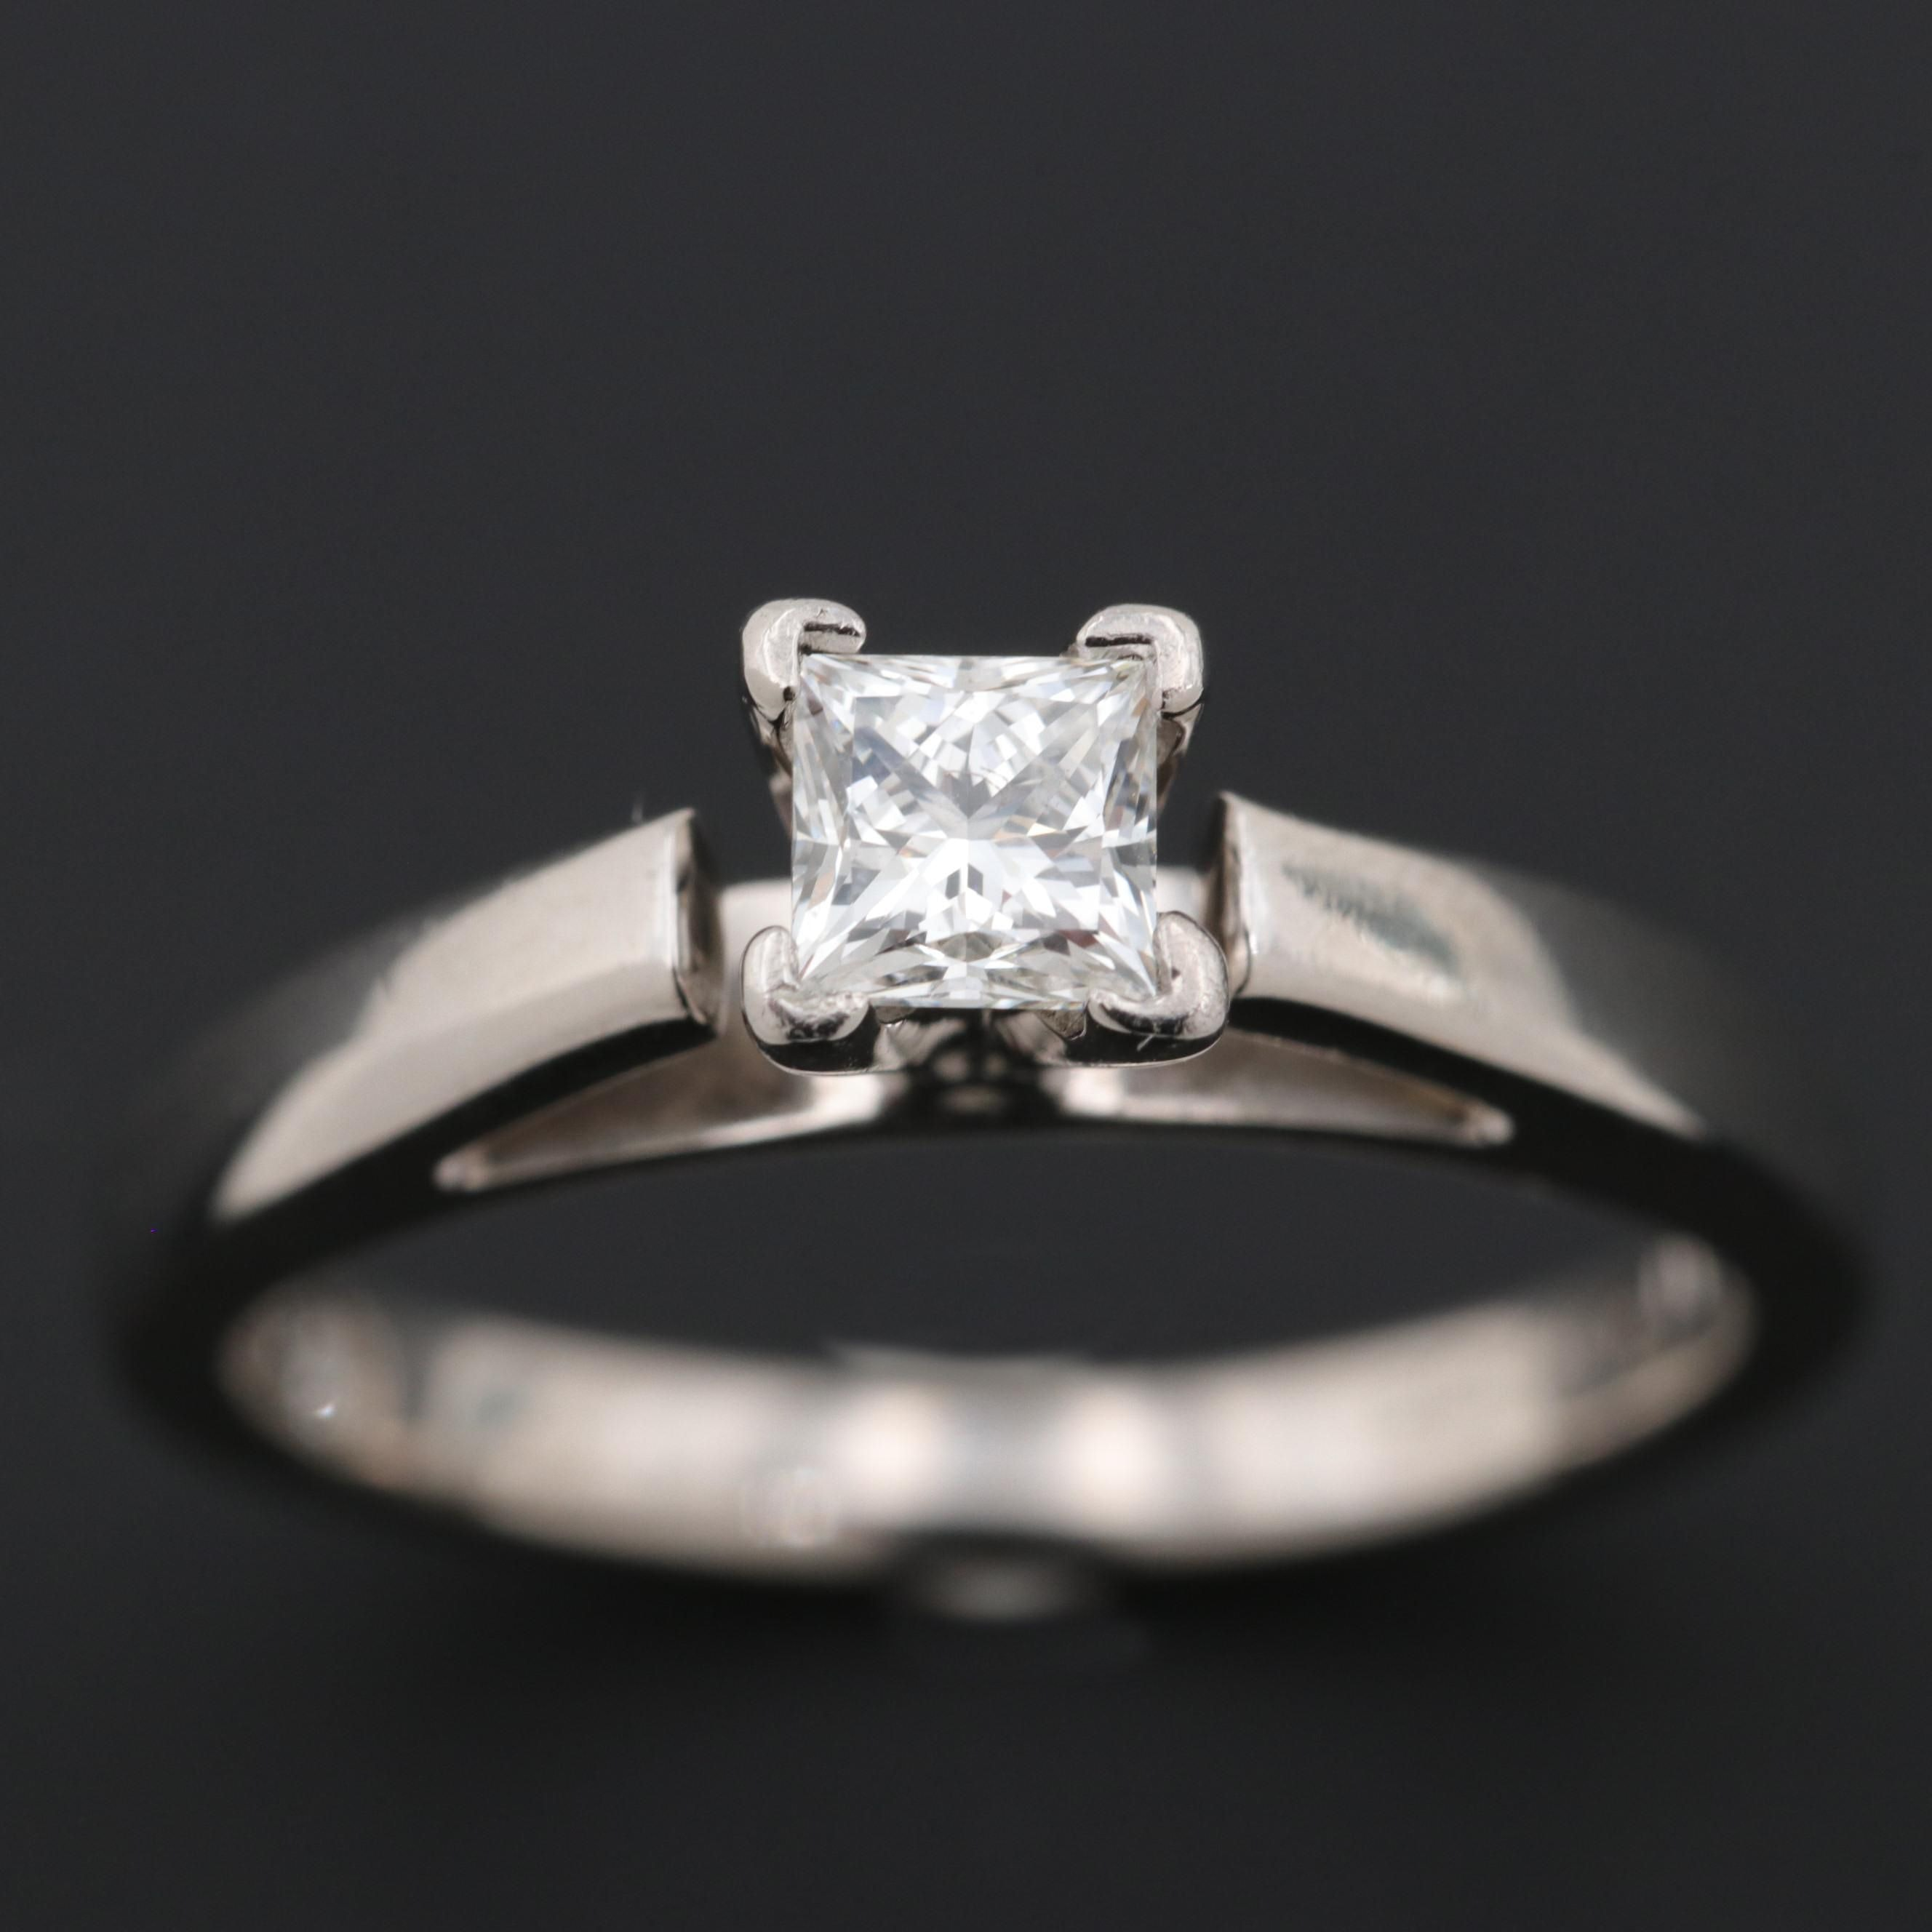 """The Leo"" 14K White Gold Platinum Diamond Solitaire Ring"